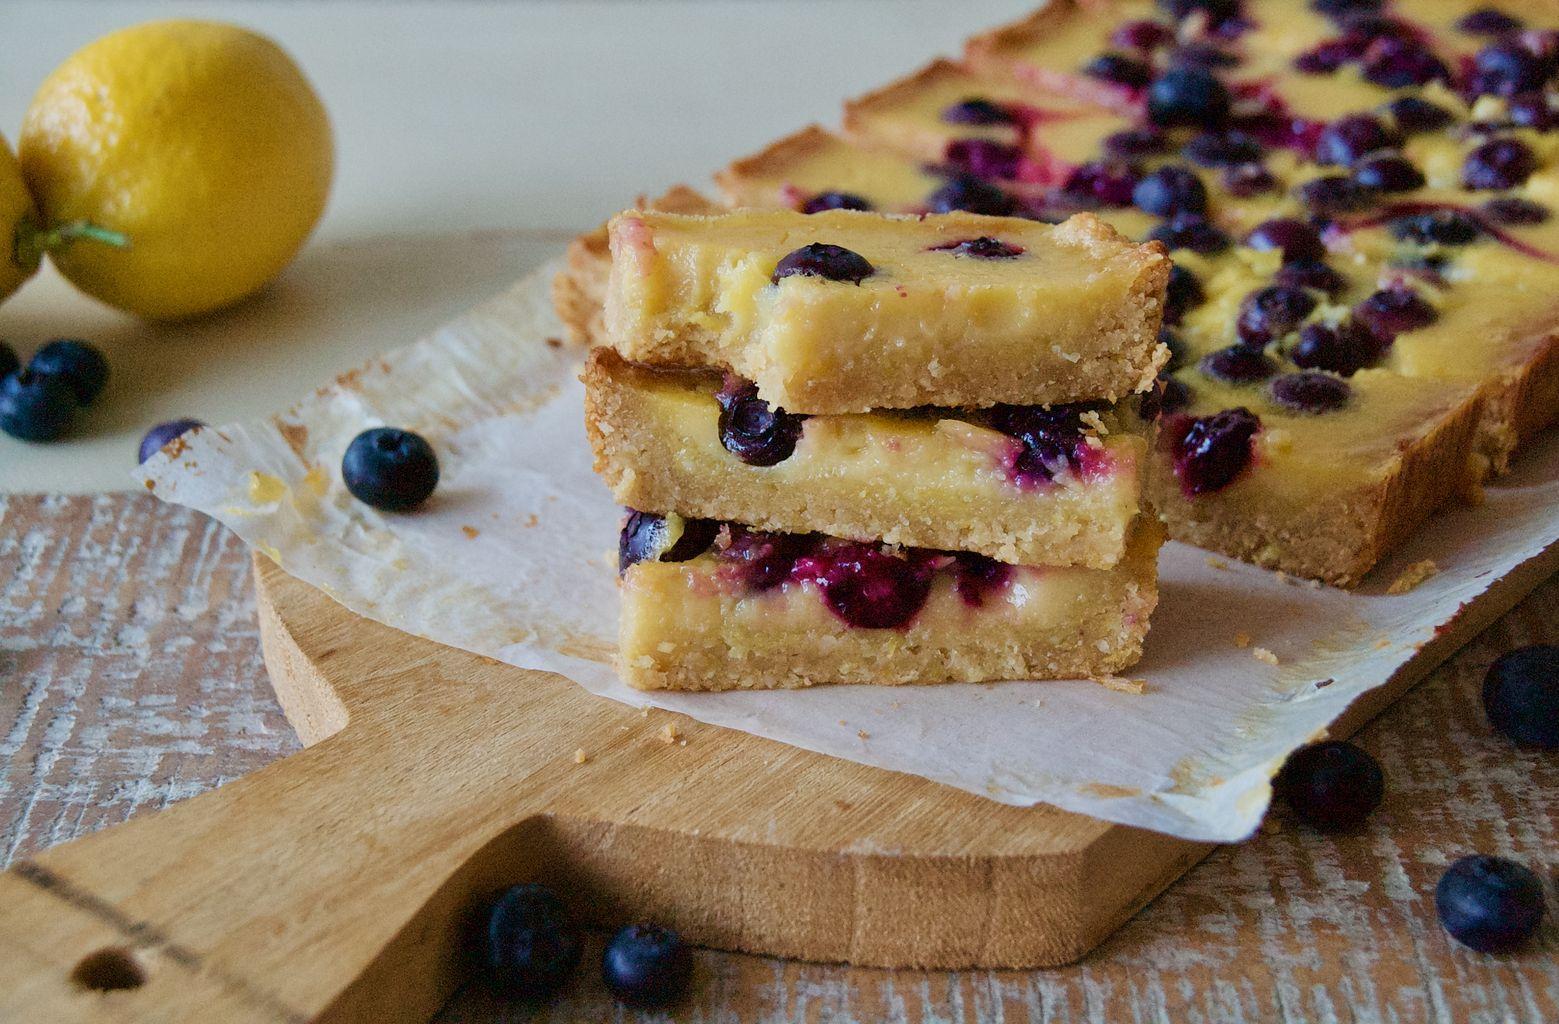 Paleo Lemon Blueberry Bar